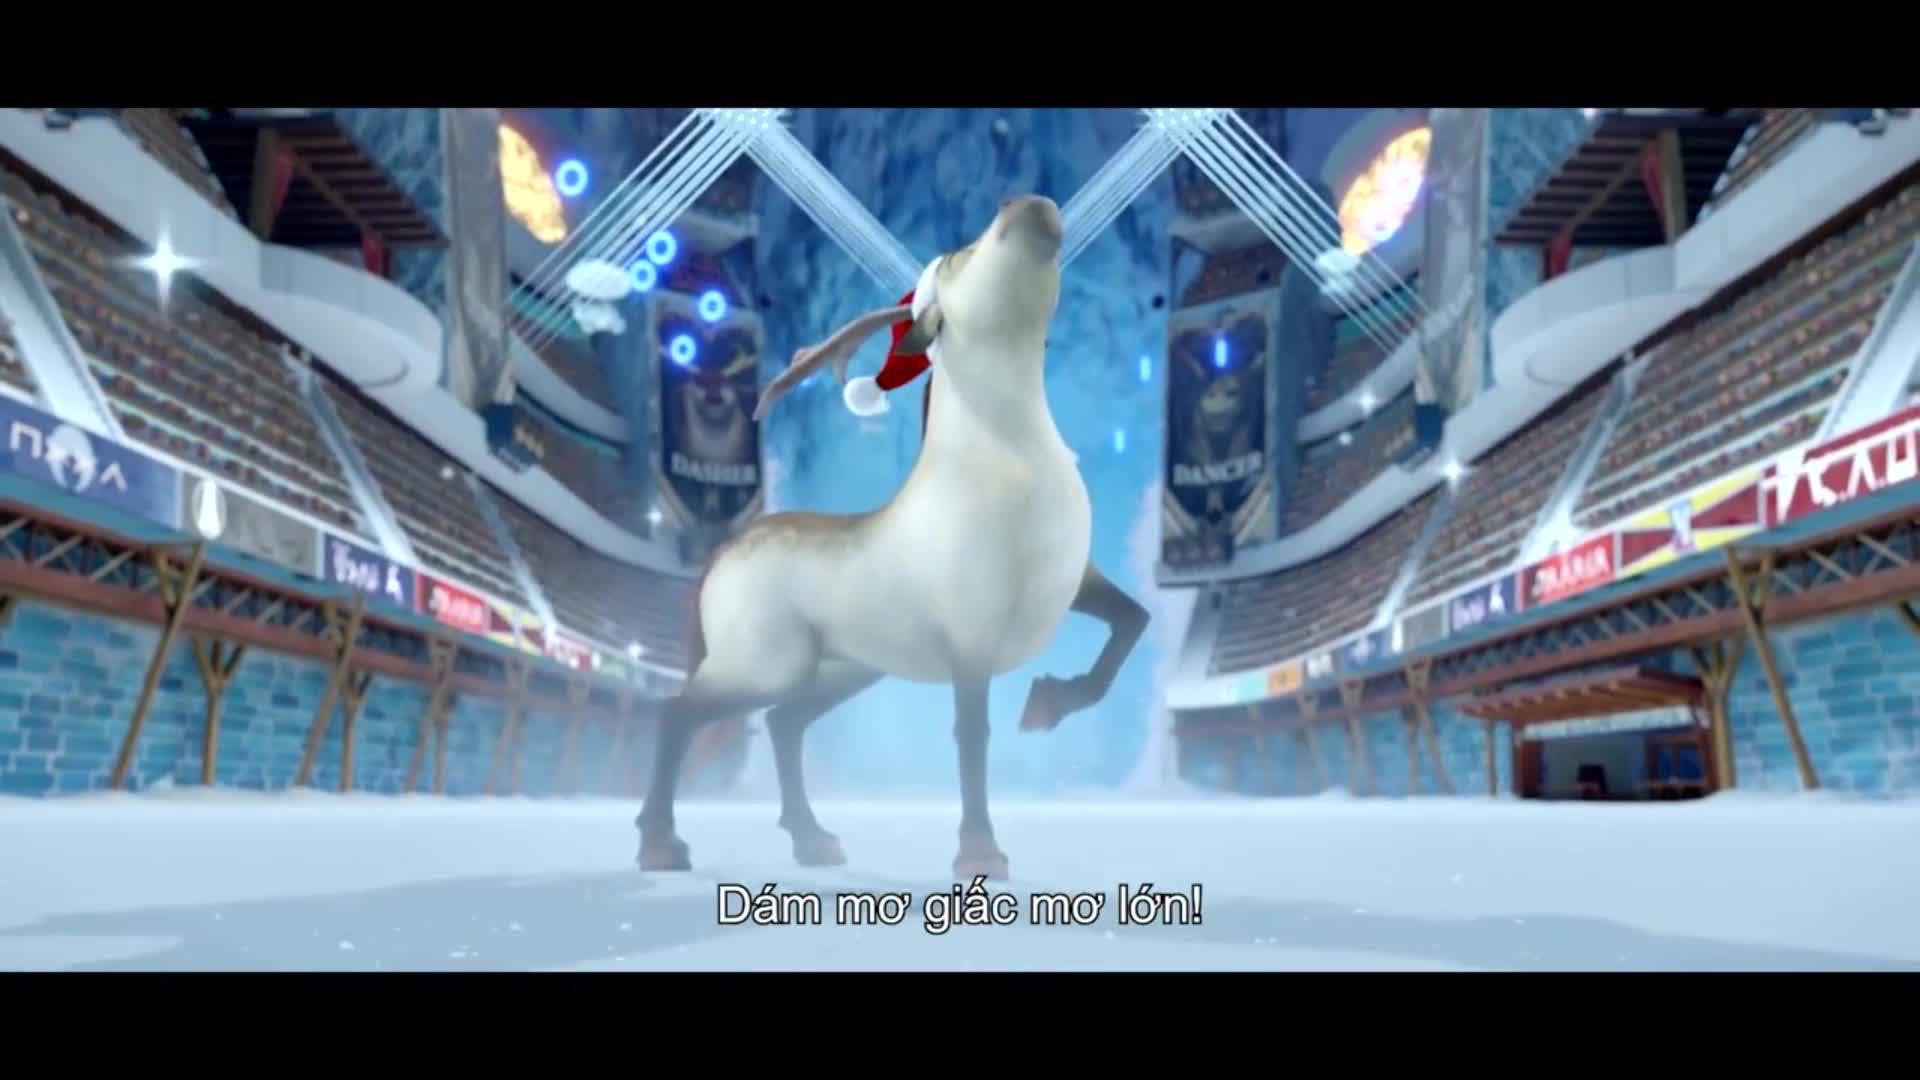 Elliot - The Littlest Reindeer (Elliot - Tuần lộc giả danh)